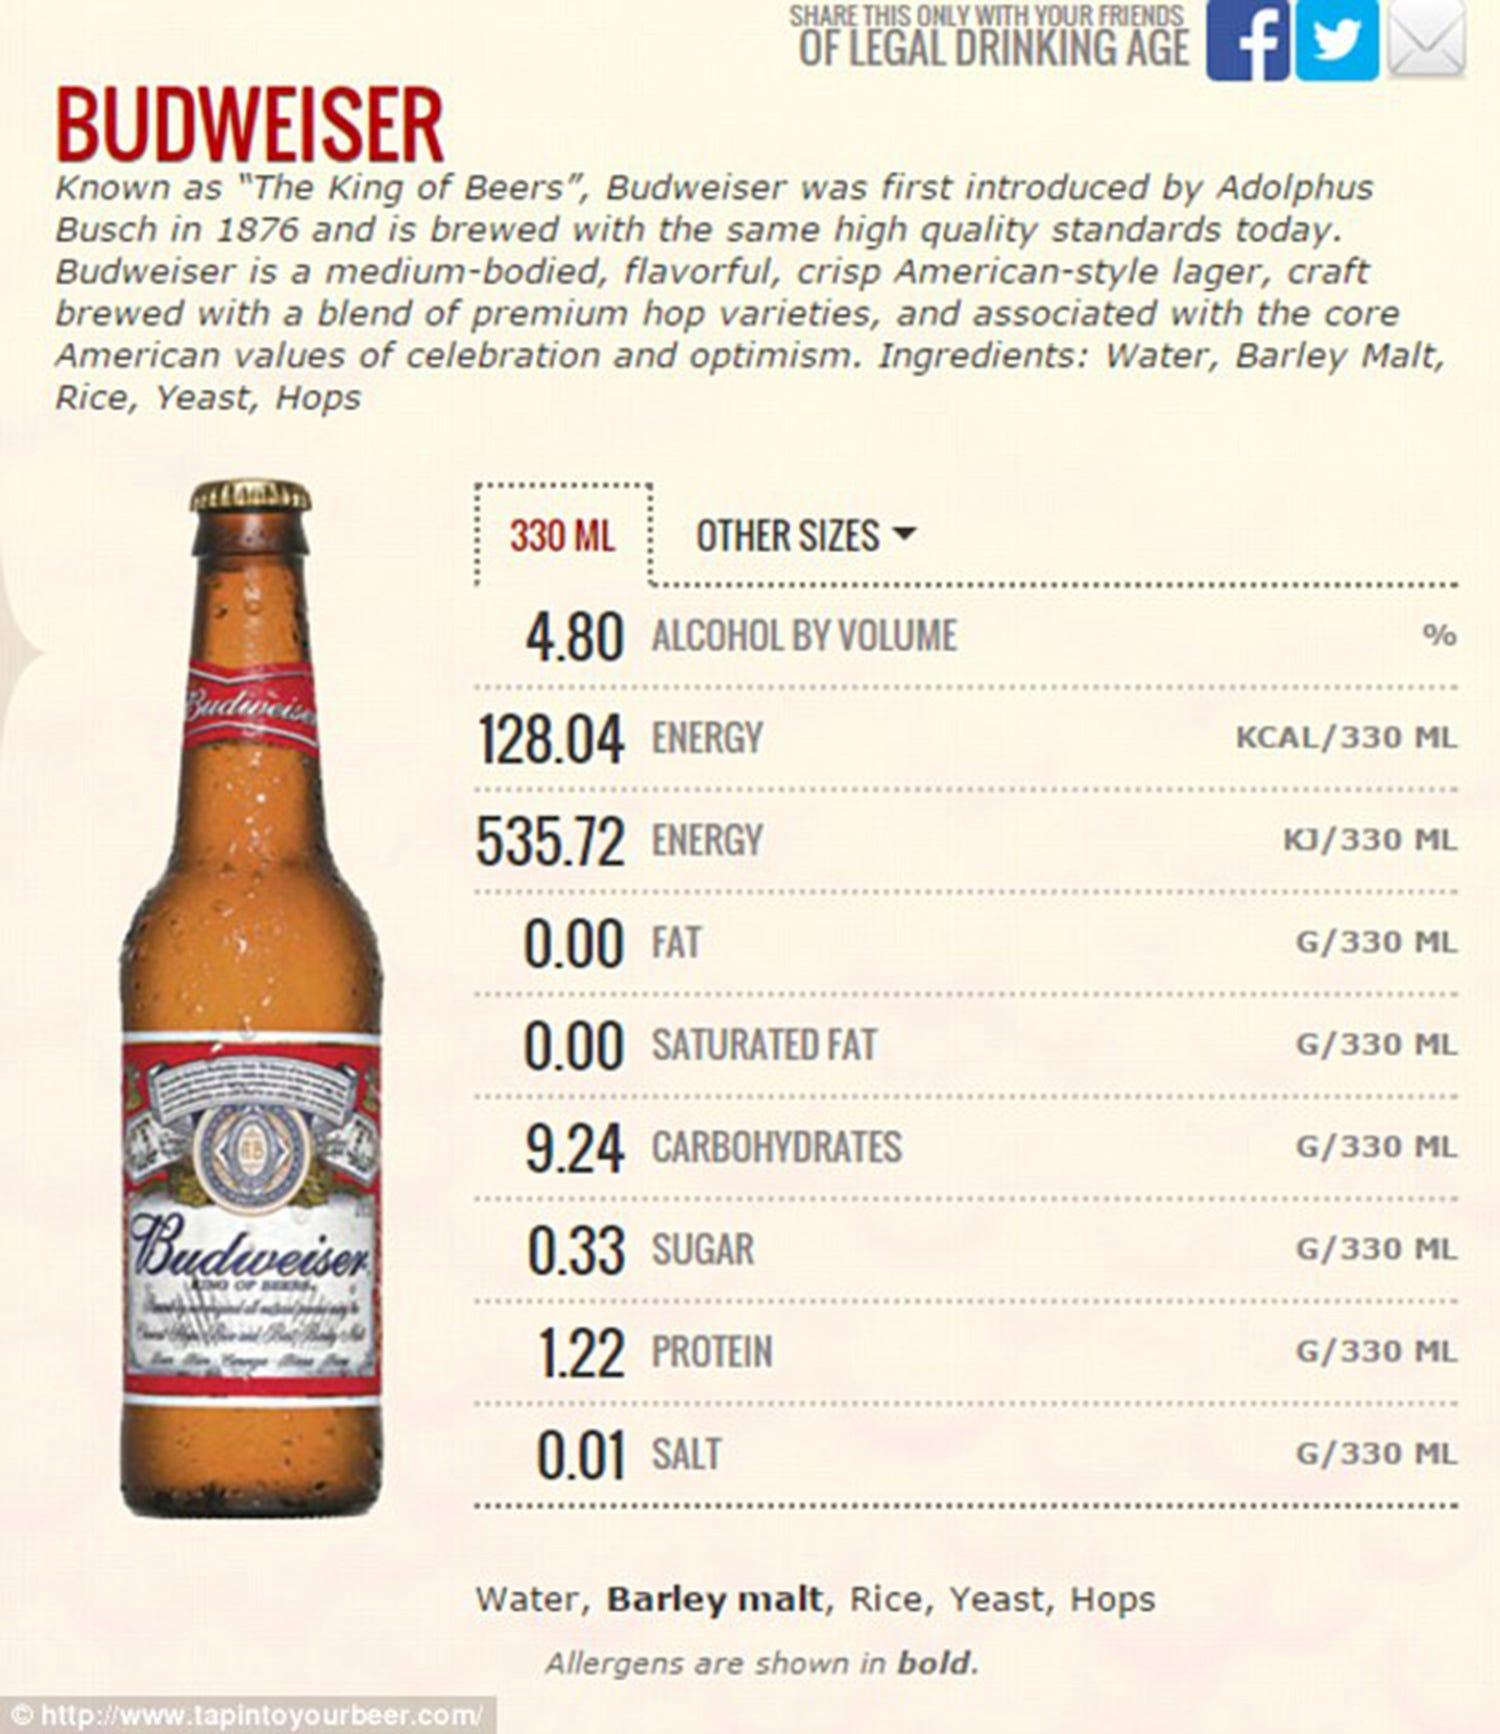 budweiser beer calories - HD1500×1734